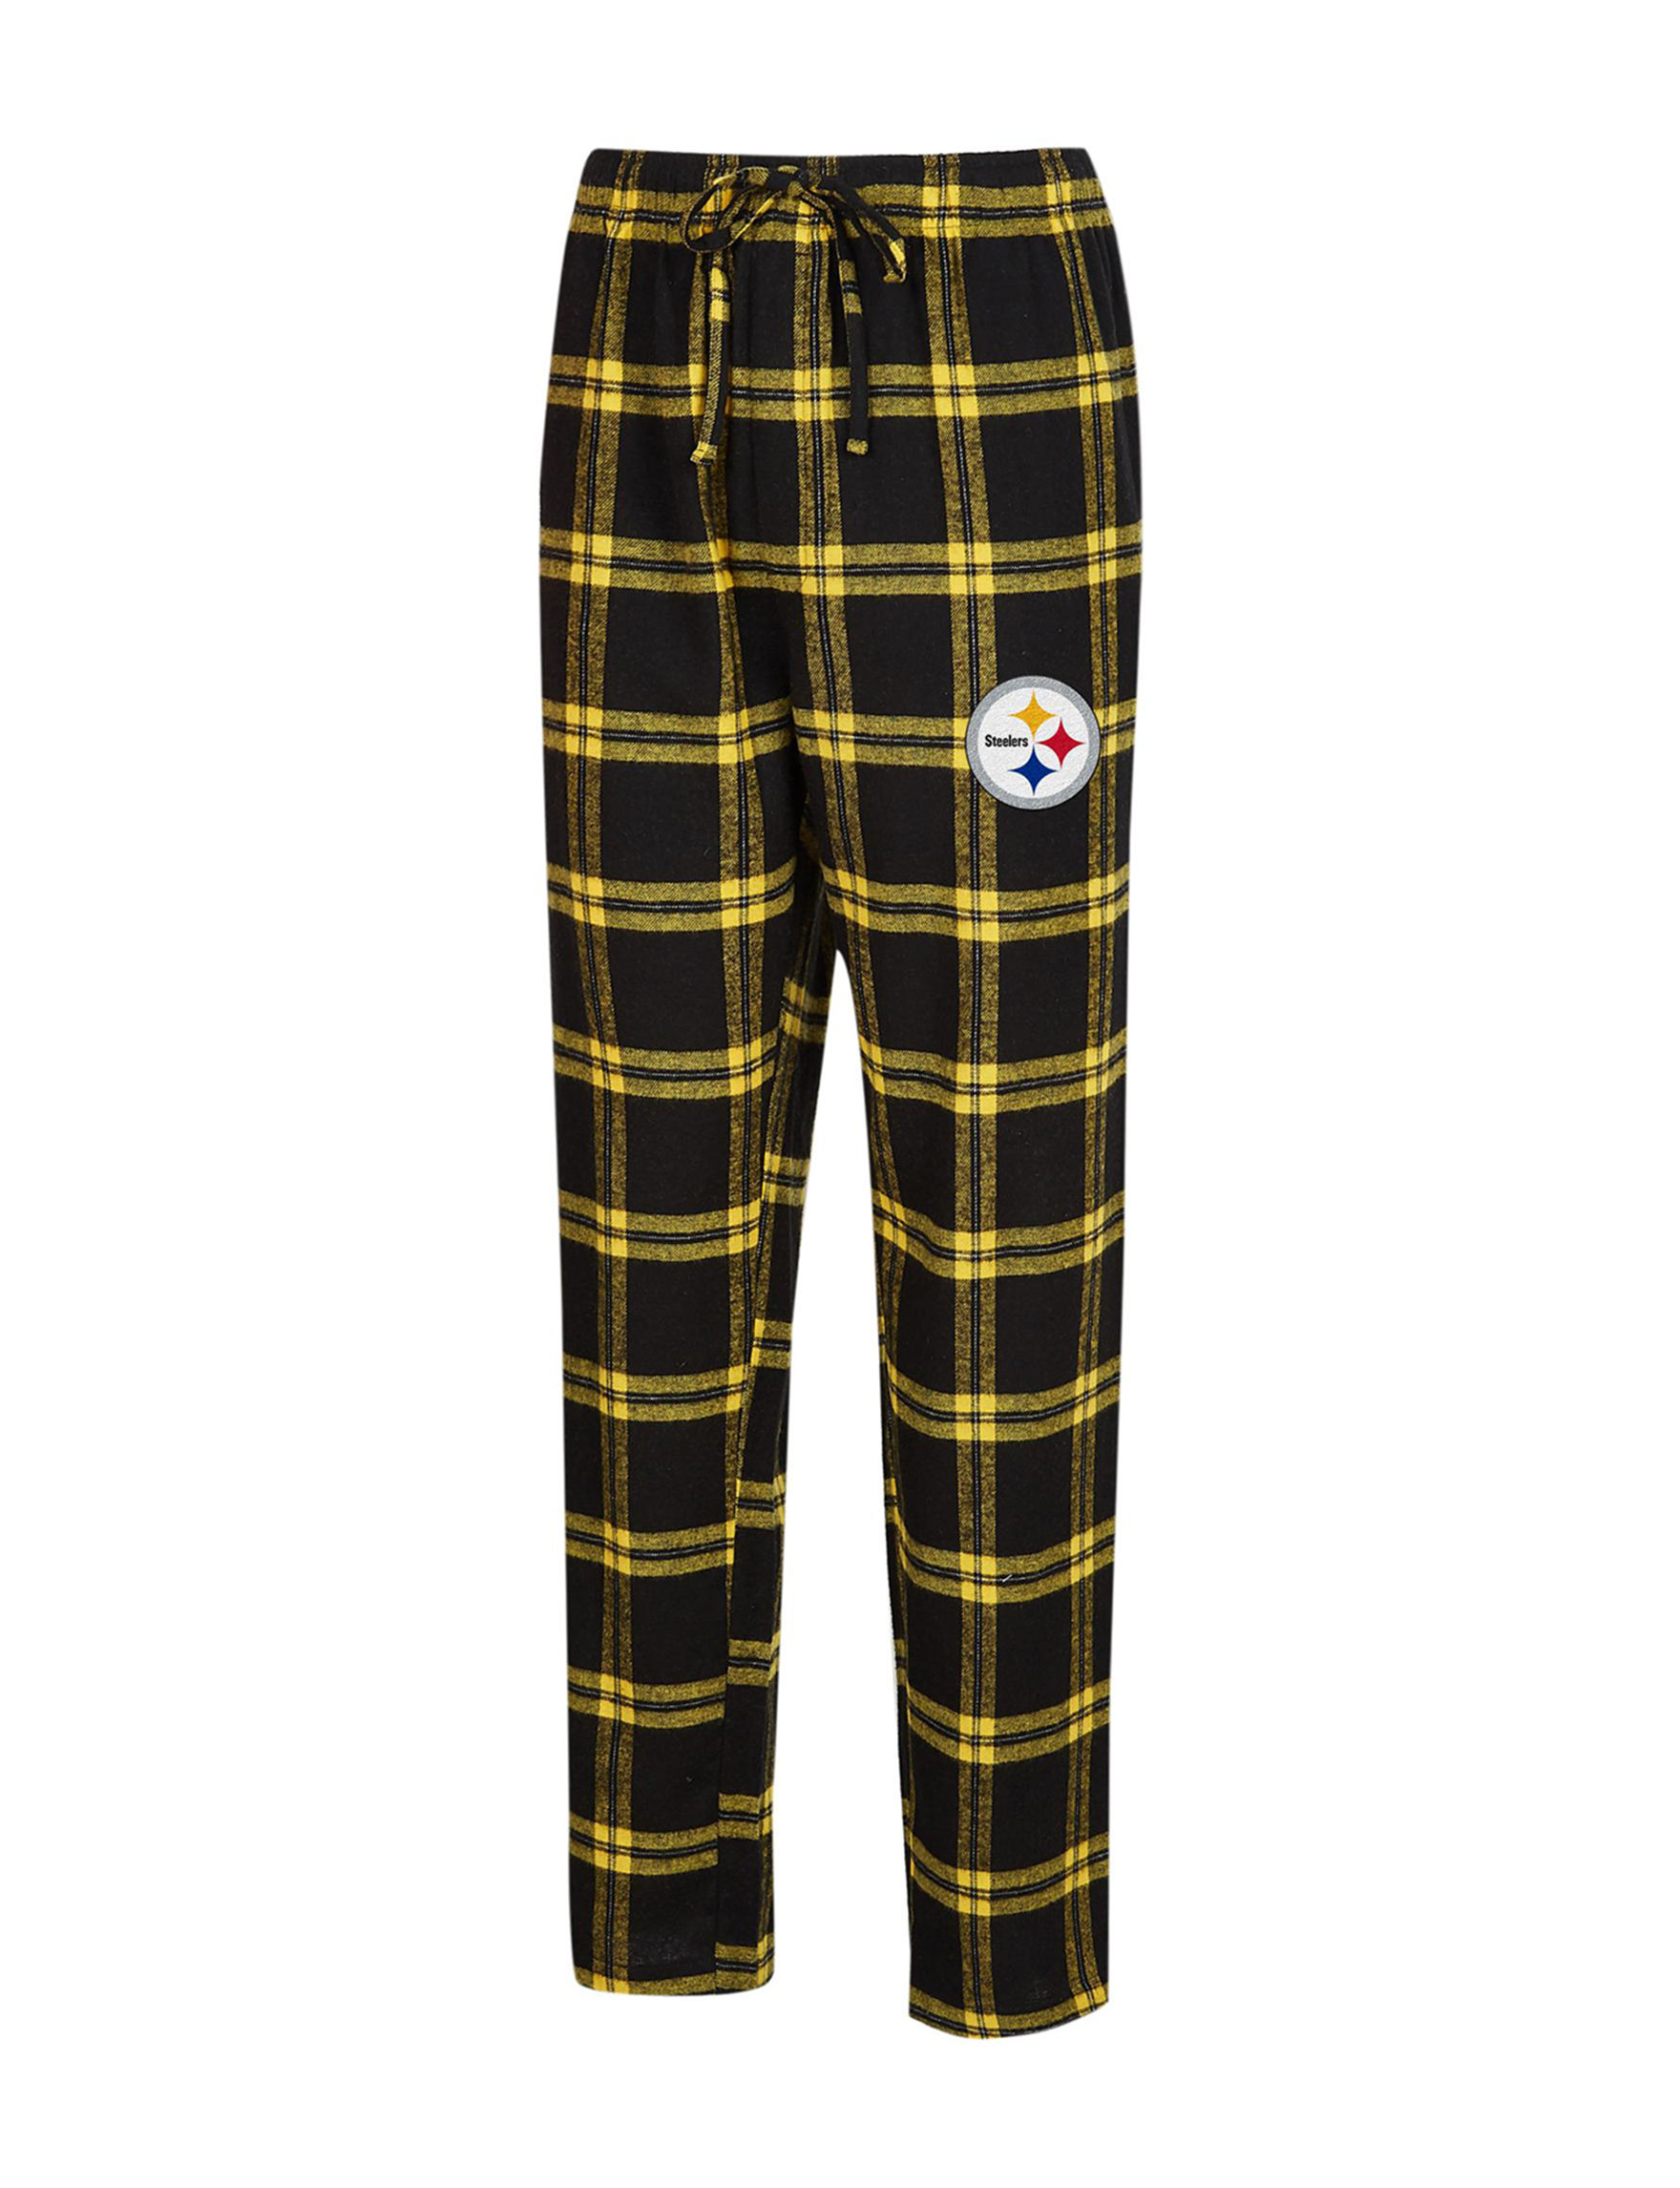 NFL Black / Gold Pajama Bottoms